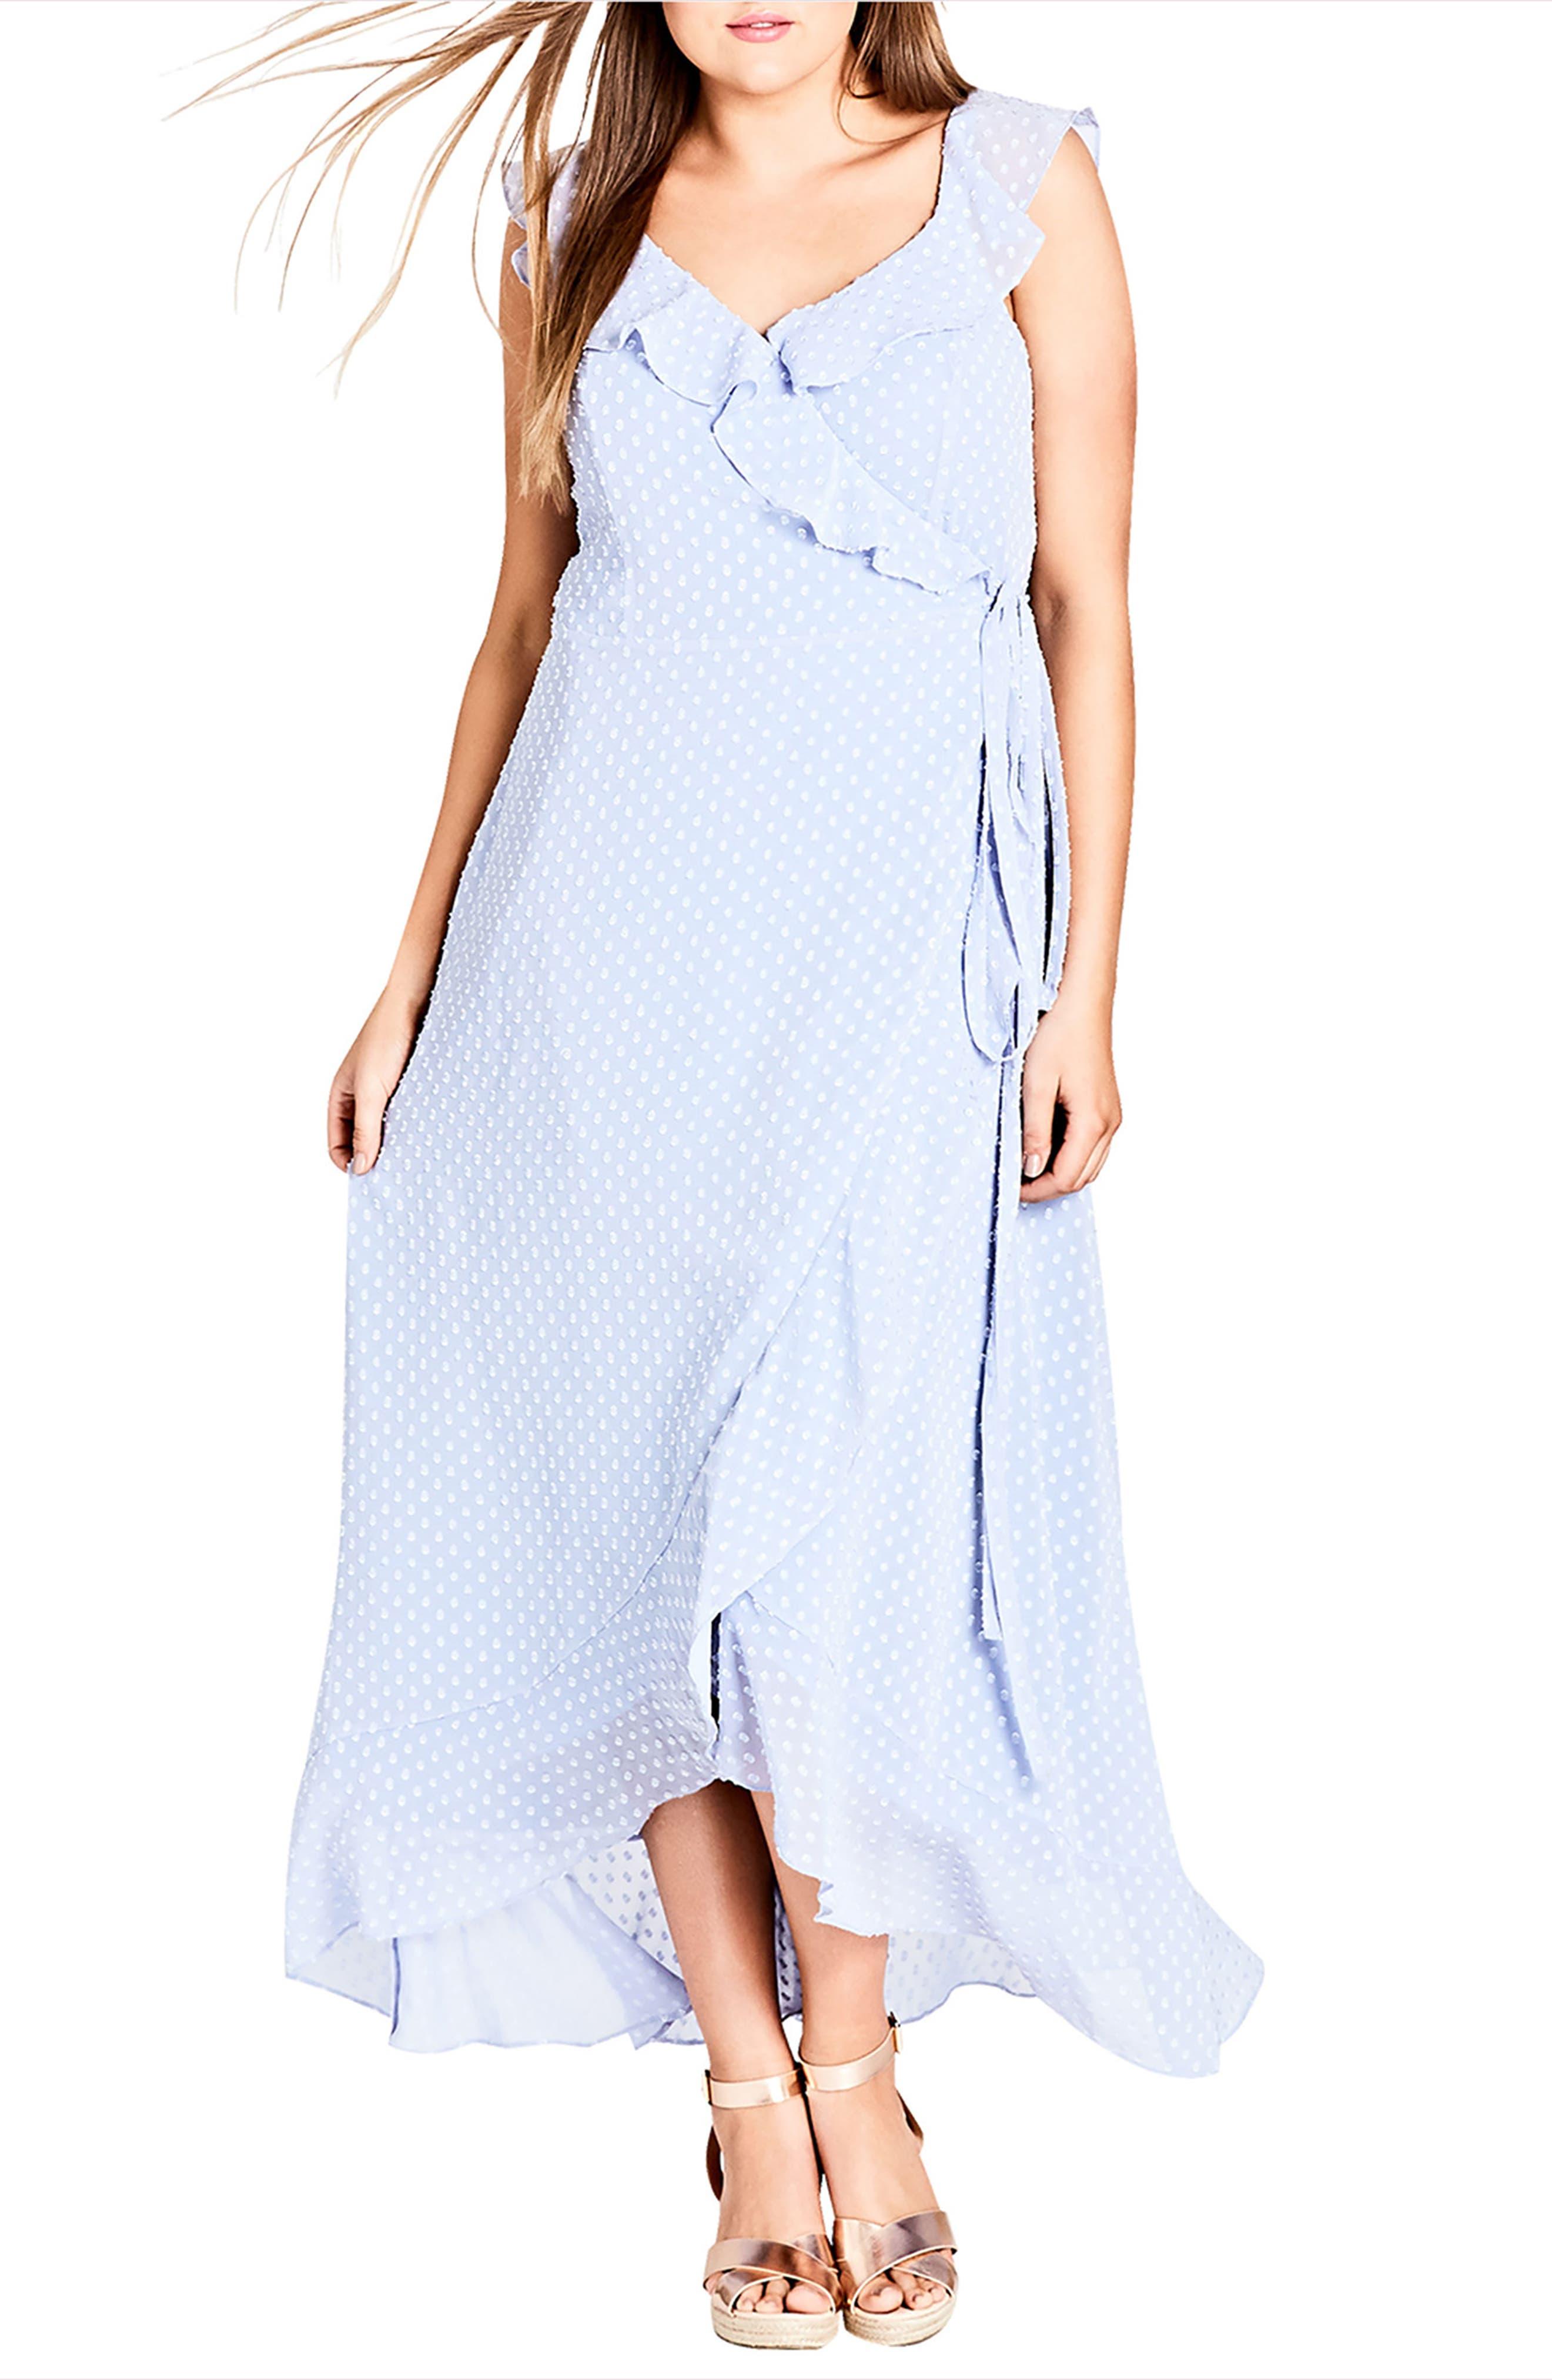 City Chic Dot Fil Coupé Ruffle Maxi Dress (Plus Size)